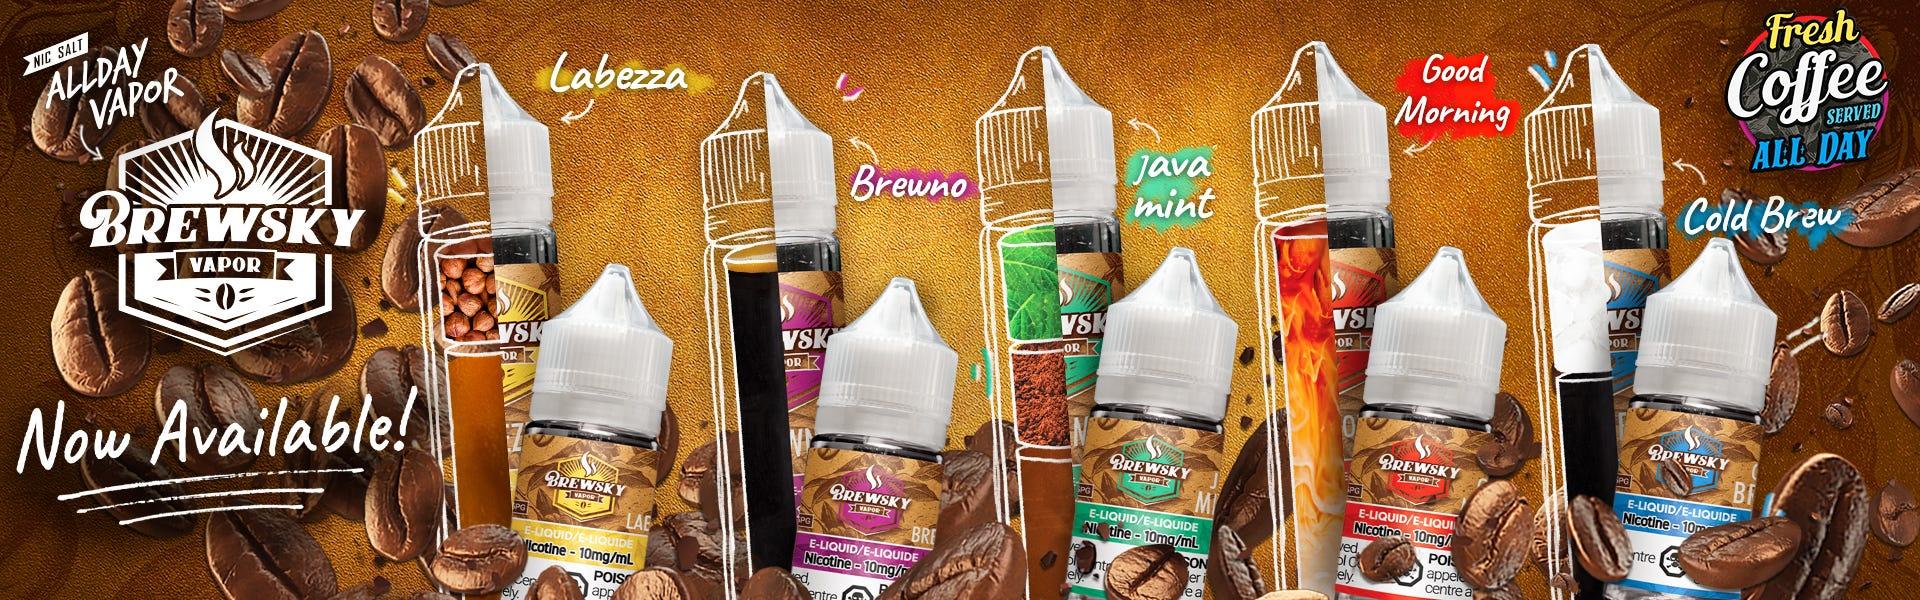 Brewsky Vapor coffee flavours by Allday Vapor available now!